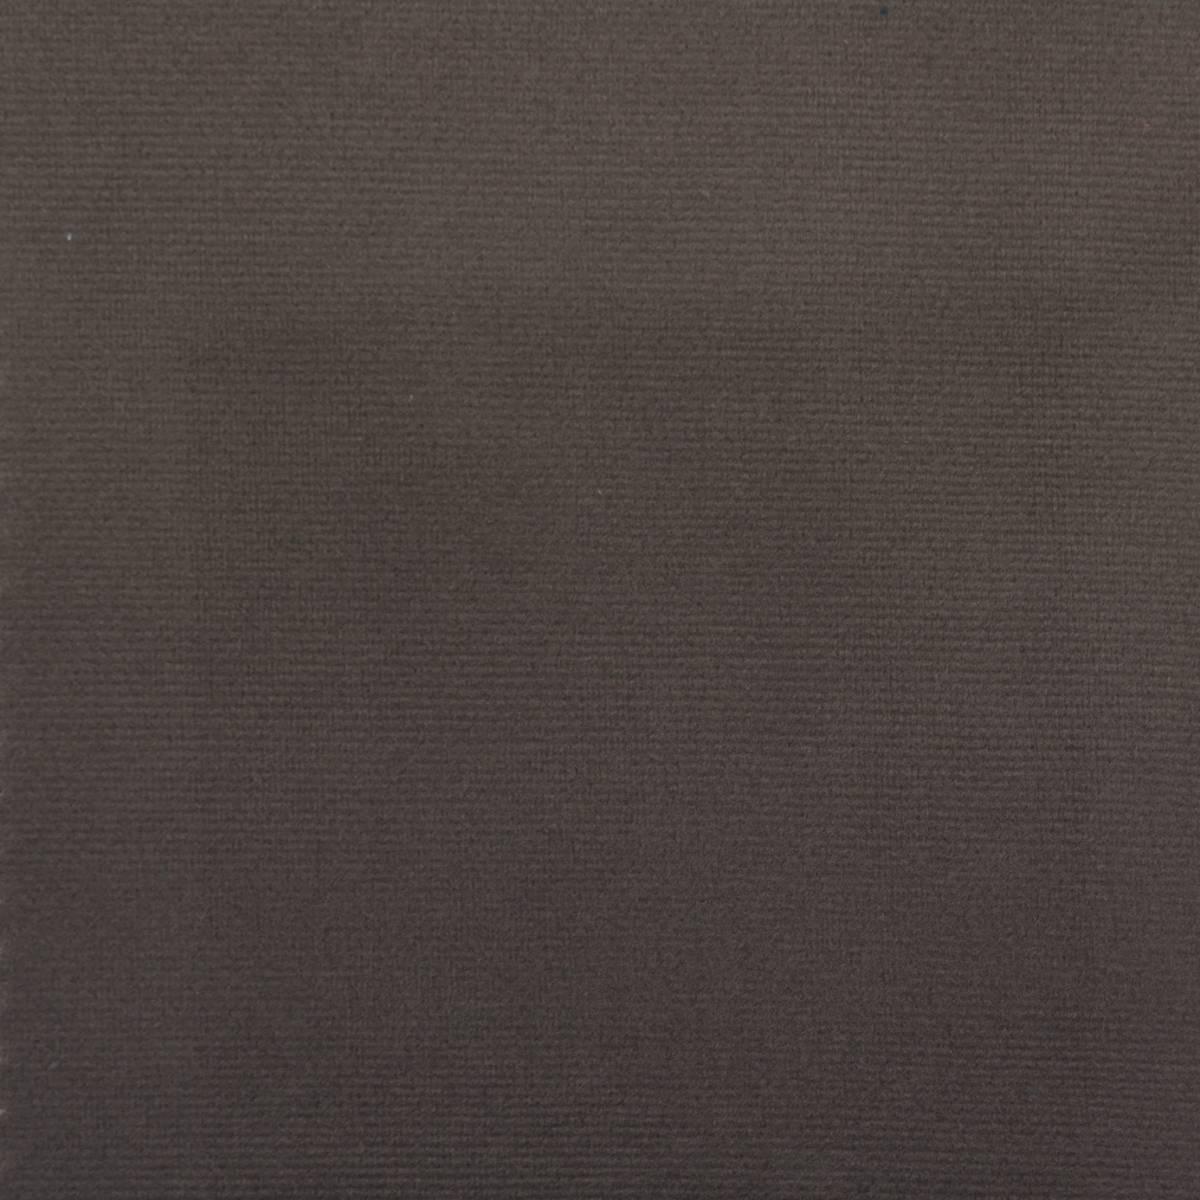 Plush Velvet Fabric Mole Plushvmole Warwick Plush